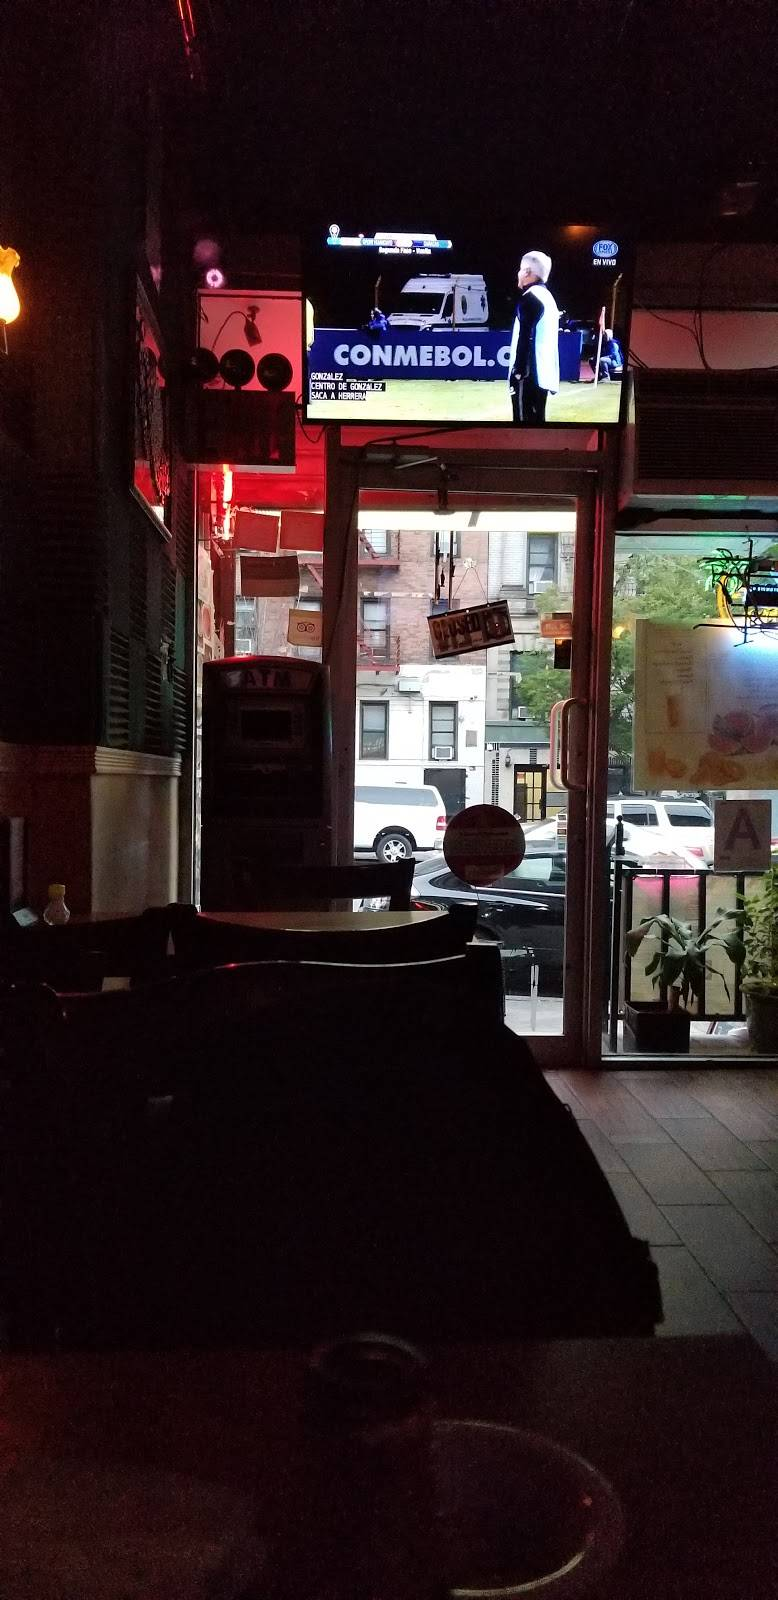 Il Gnocchi | restaurant | 118 E 116th St, New York, NY 10029, USA | 2122892006 OR +1 212-289-2006